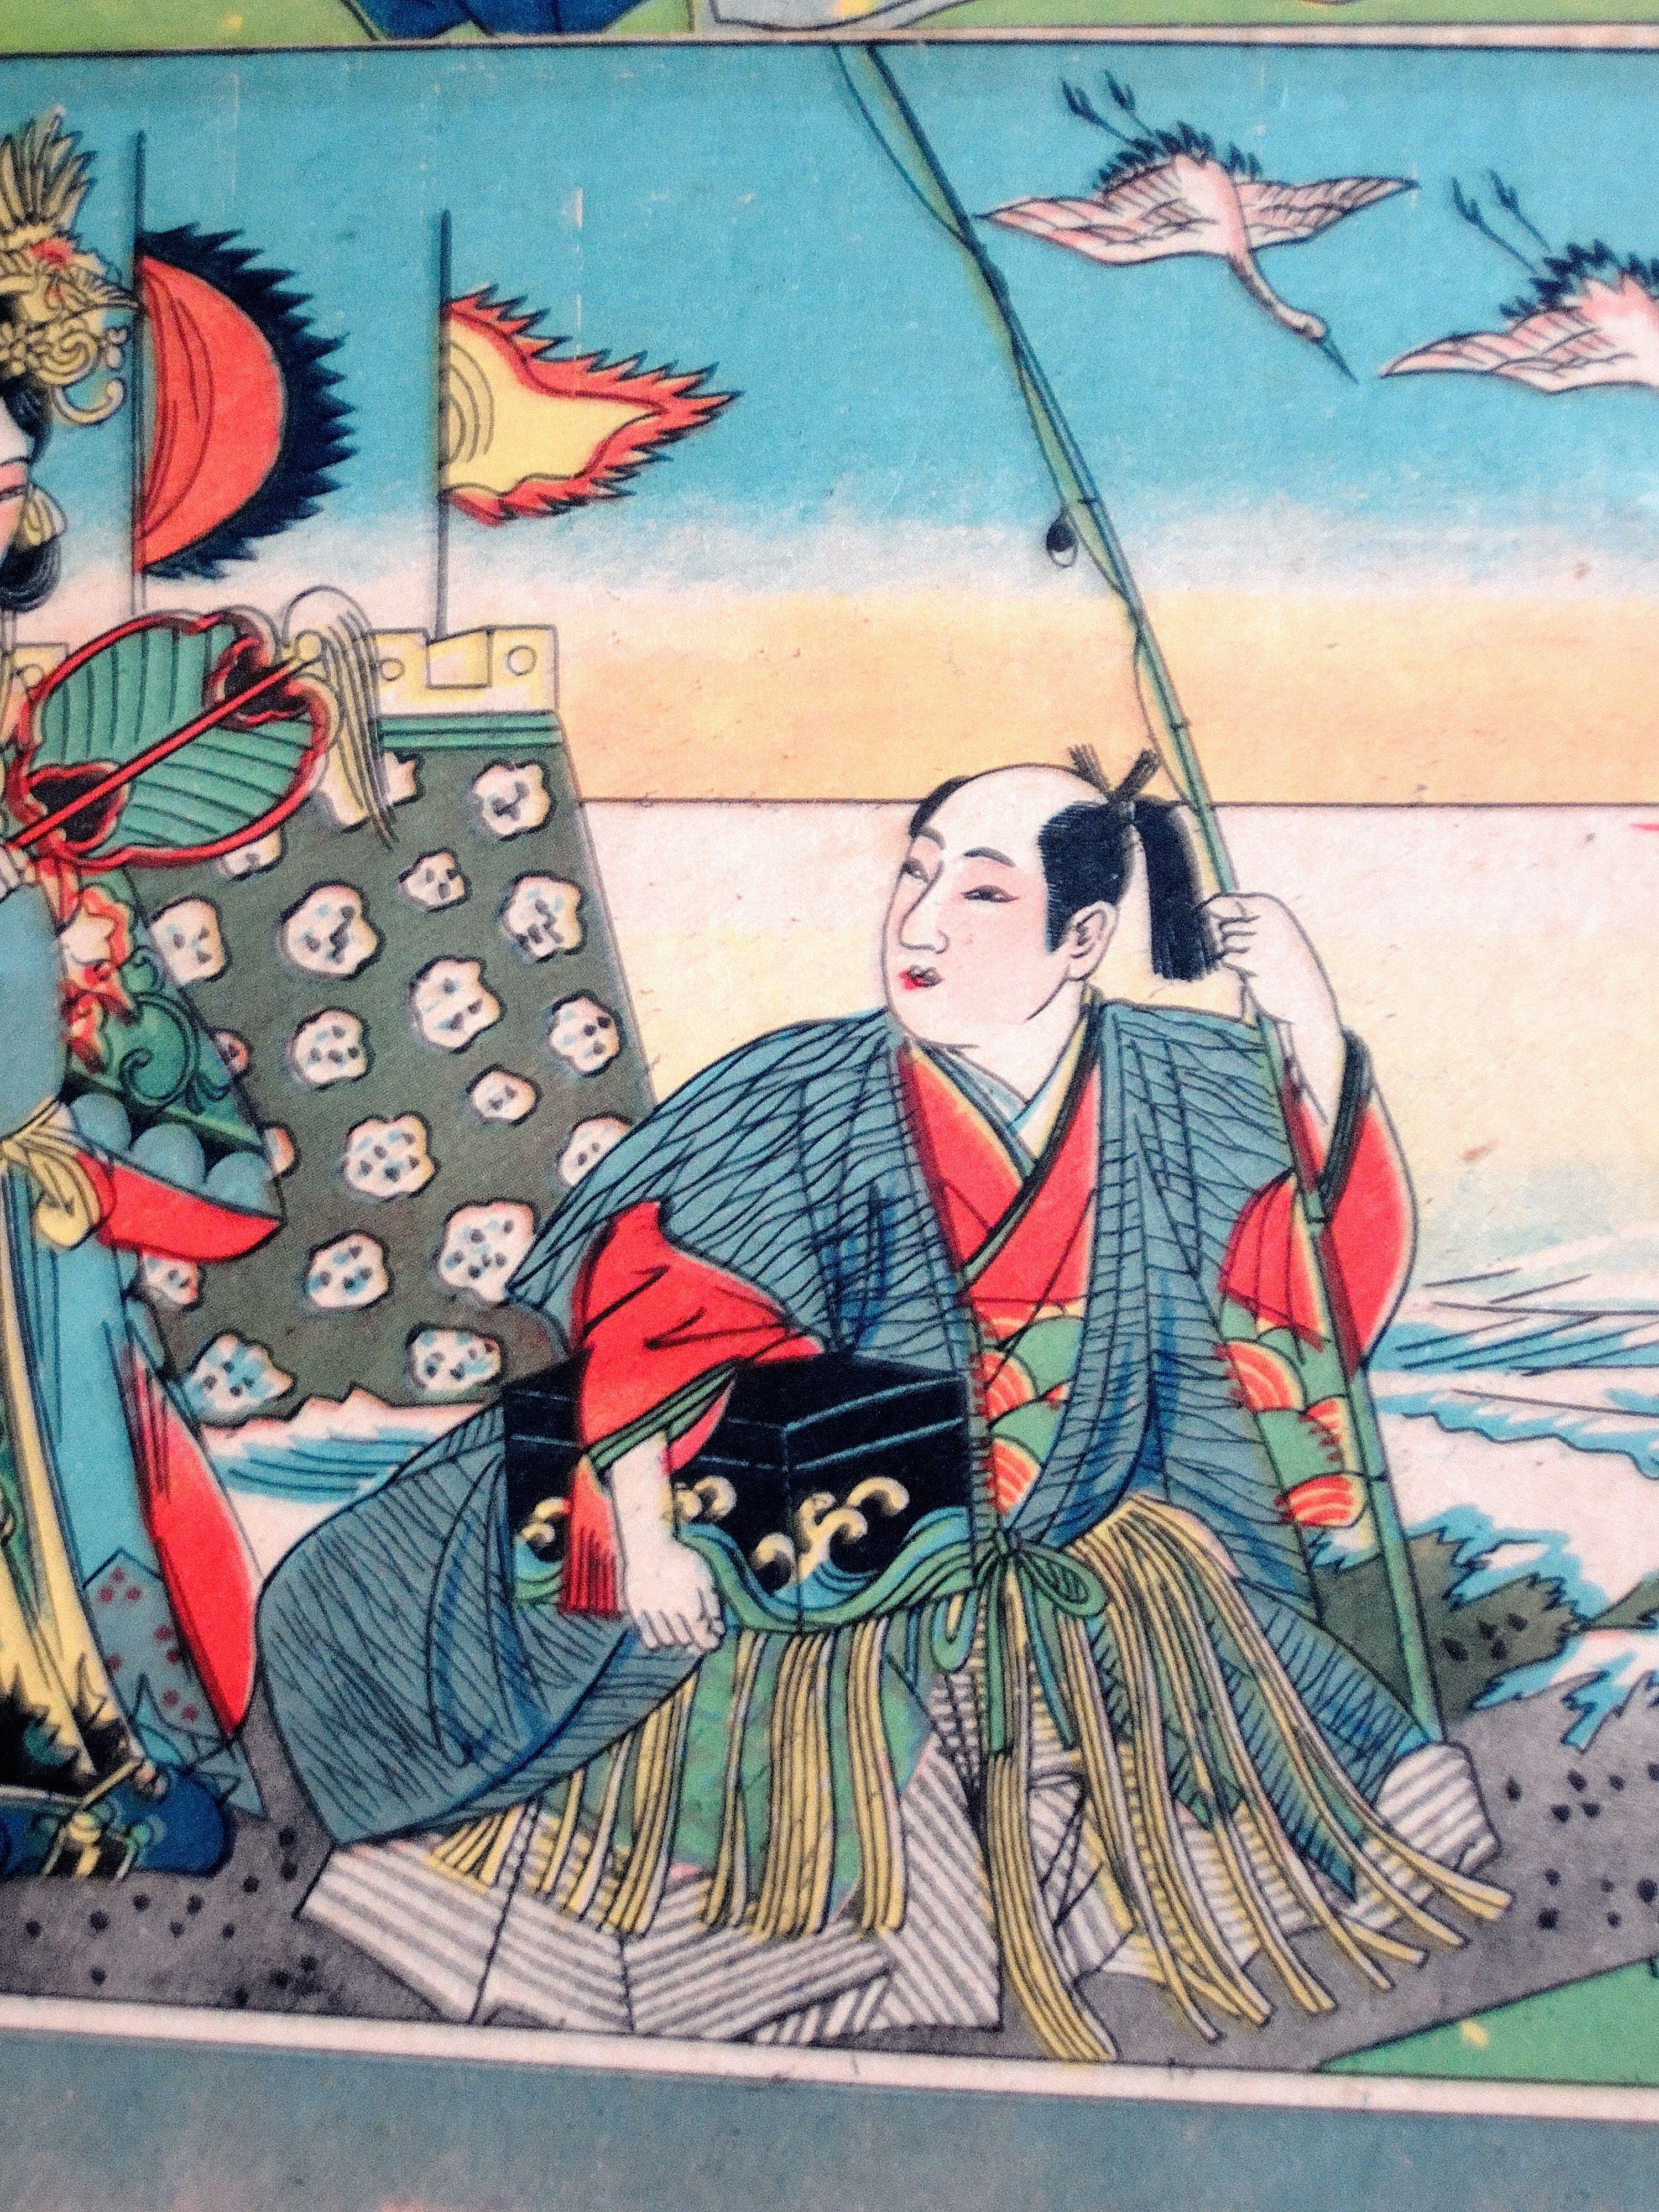 浦島太郎 Taro Urashima From An Old Tale 浦島太郎 レトロ 雑貨